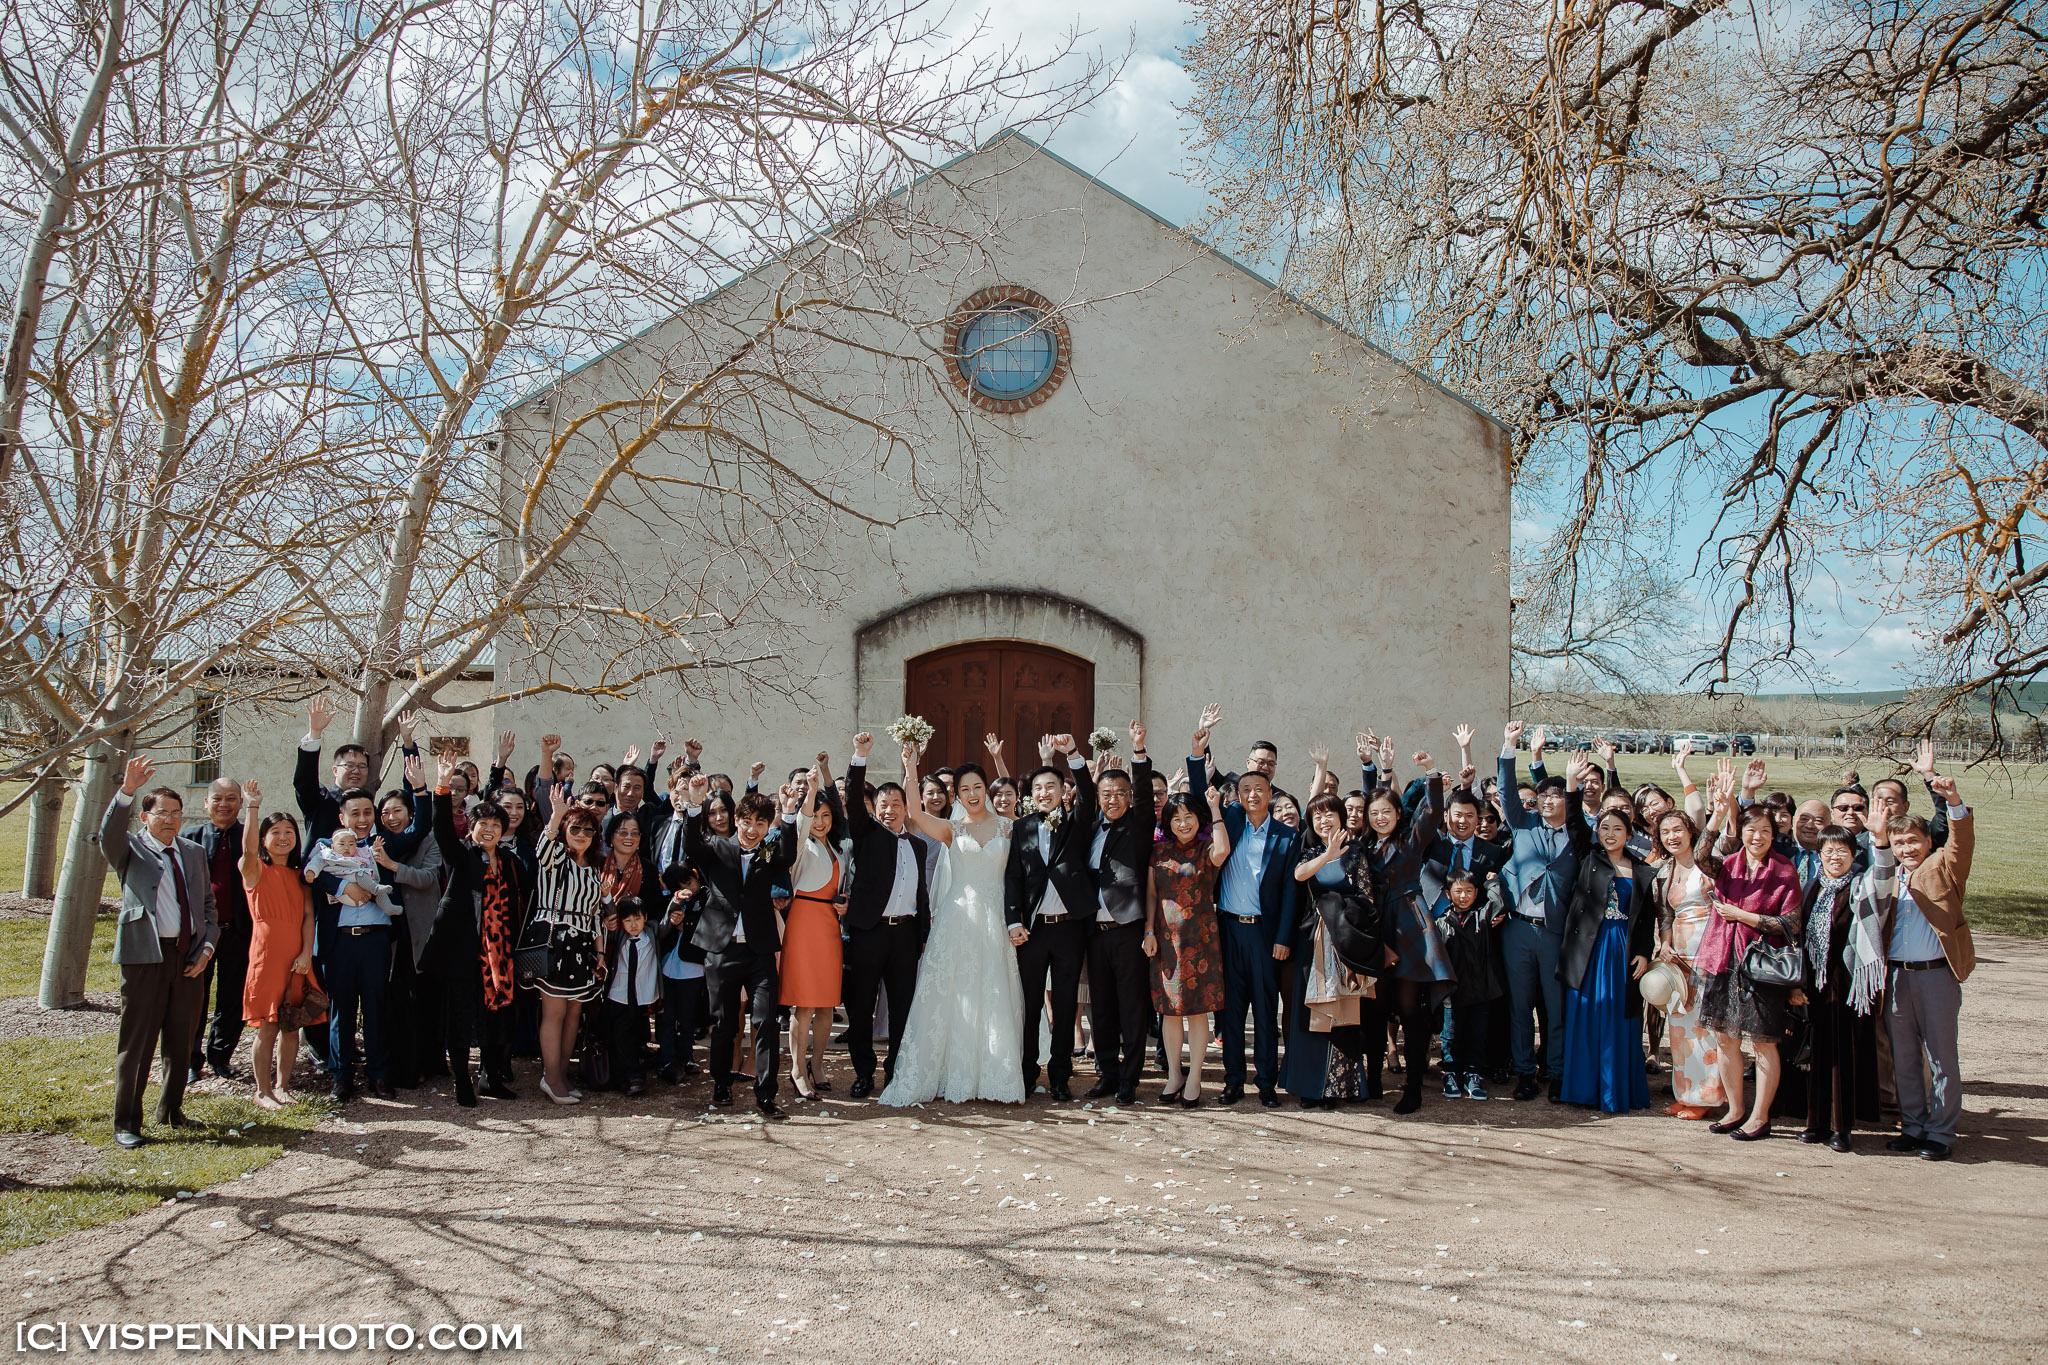 WEDDING DAY Photography Melbourne LeanneWesley 05612 1P EOSR ZHPENN